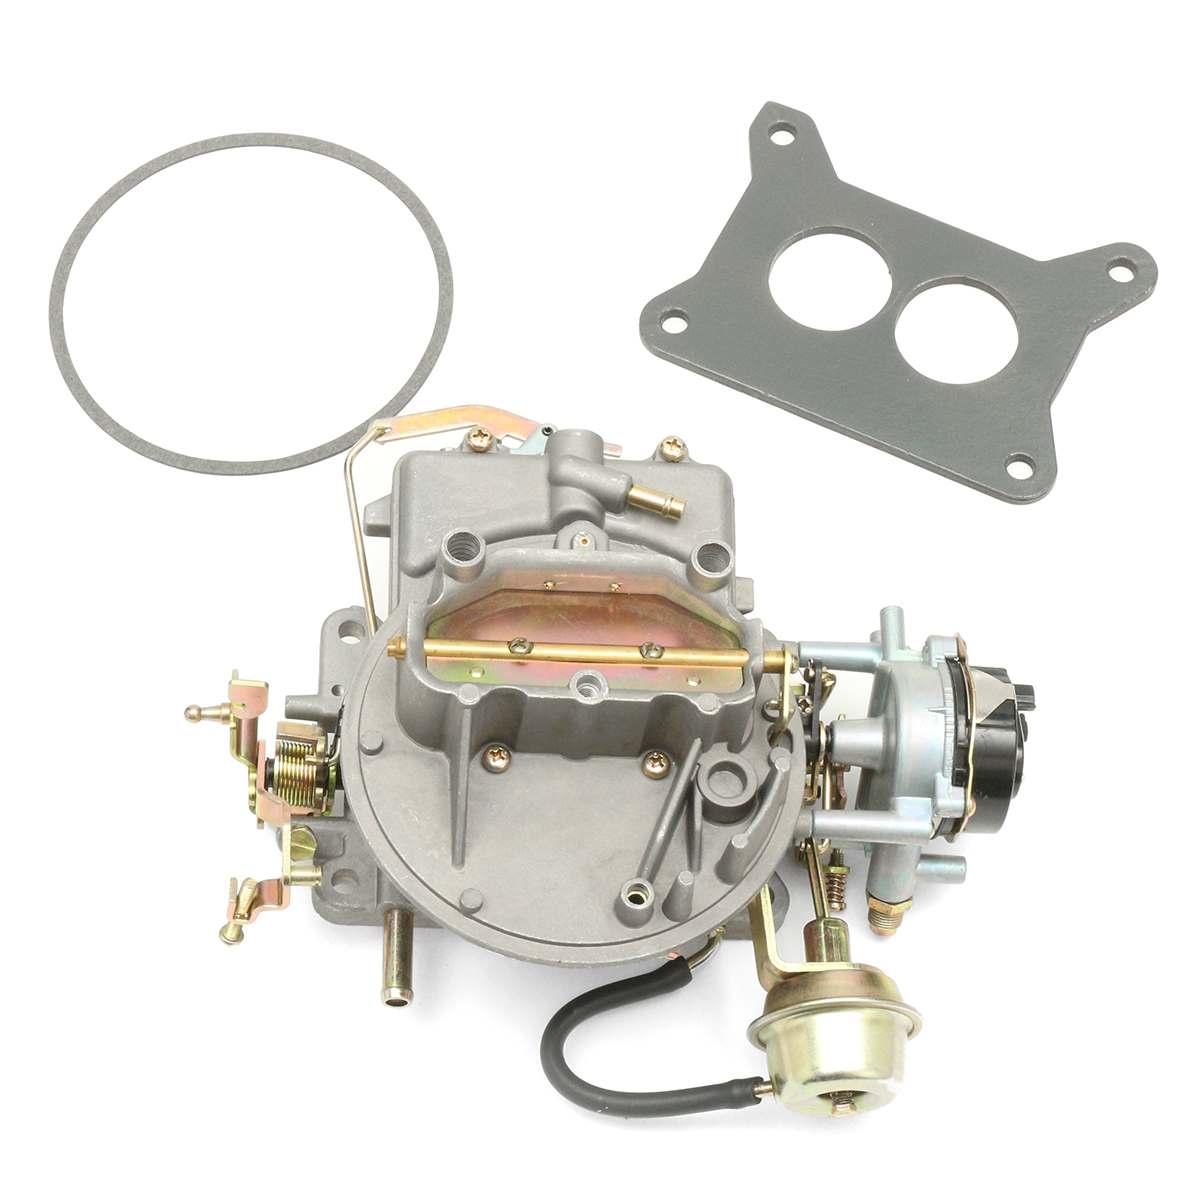 2 Barrel Carburetor Carb 2100 For Ford F100 F250 F350 for Mustang Engine 289 302 351